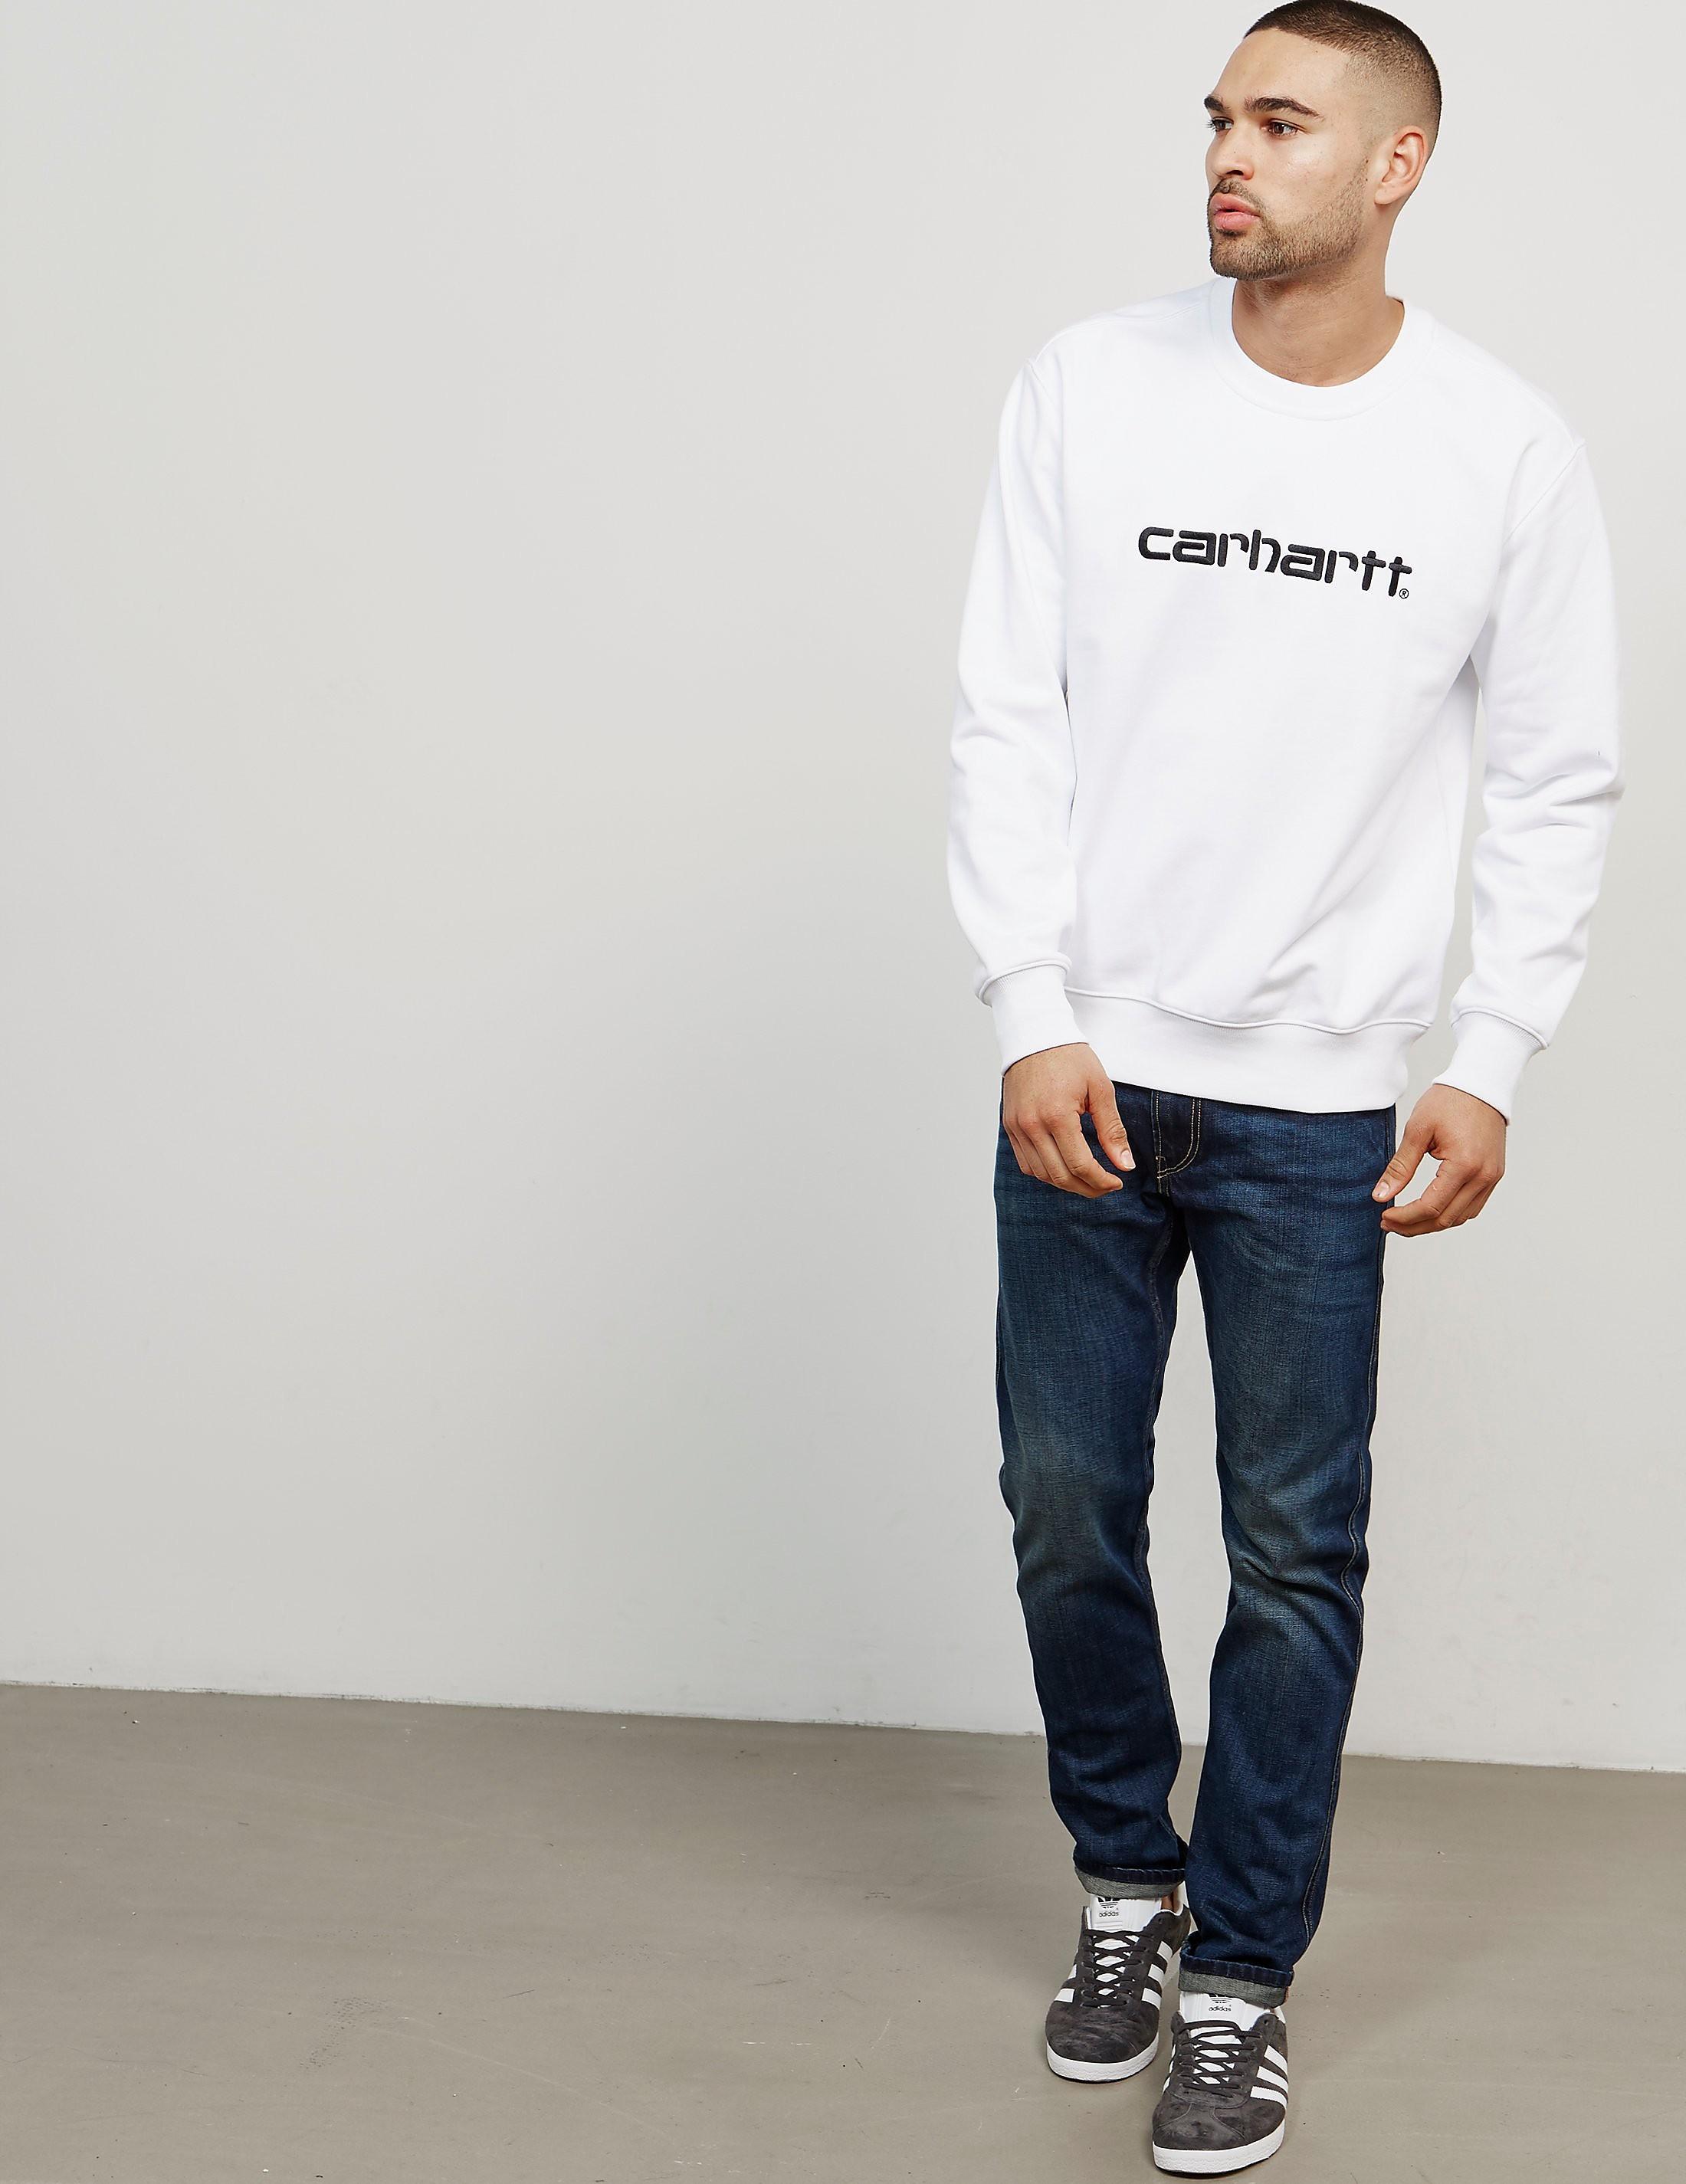 Carhartt WIP Carhartt Crew Sweatshirt